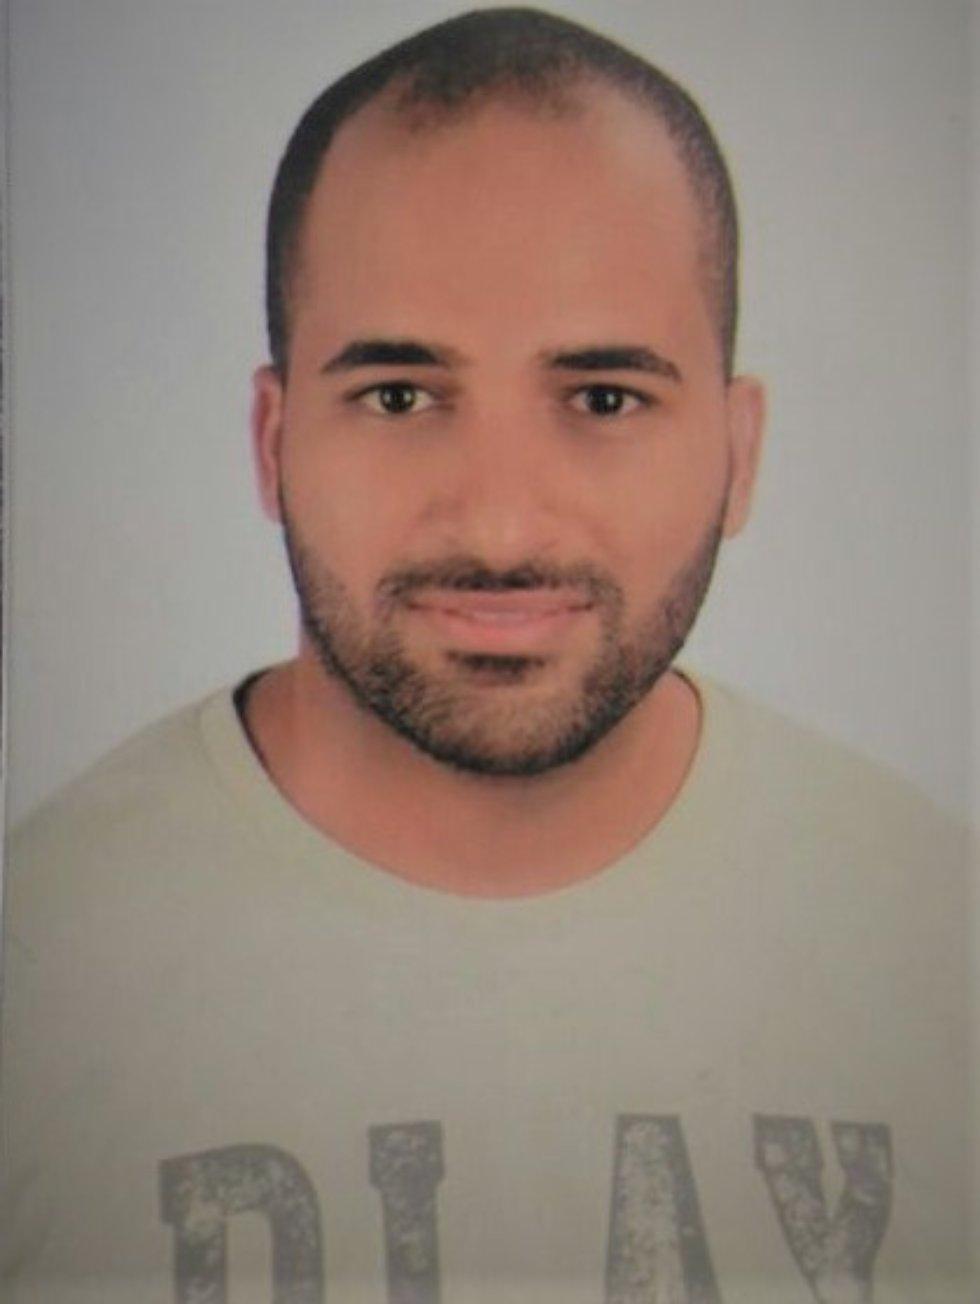 Мохаммед Валид Шаабан Фуад